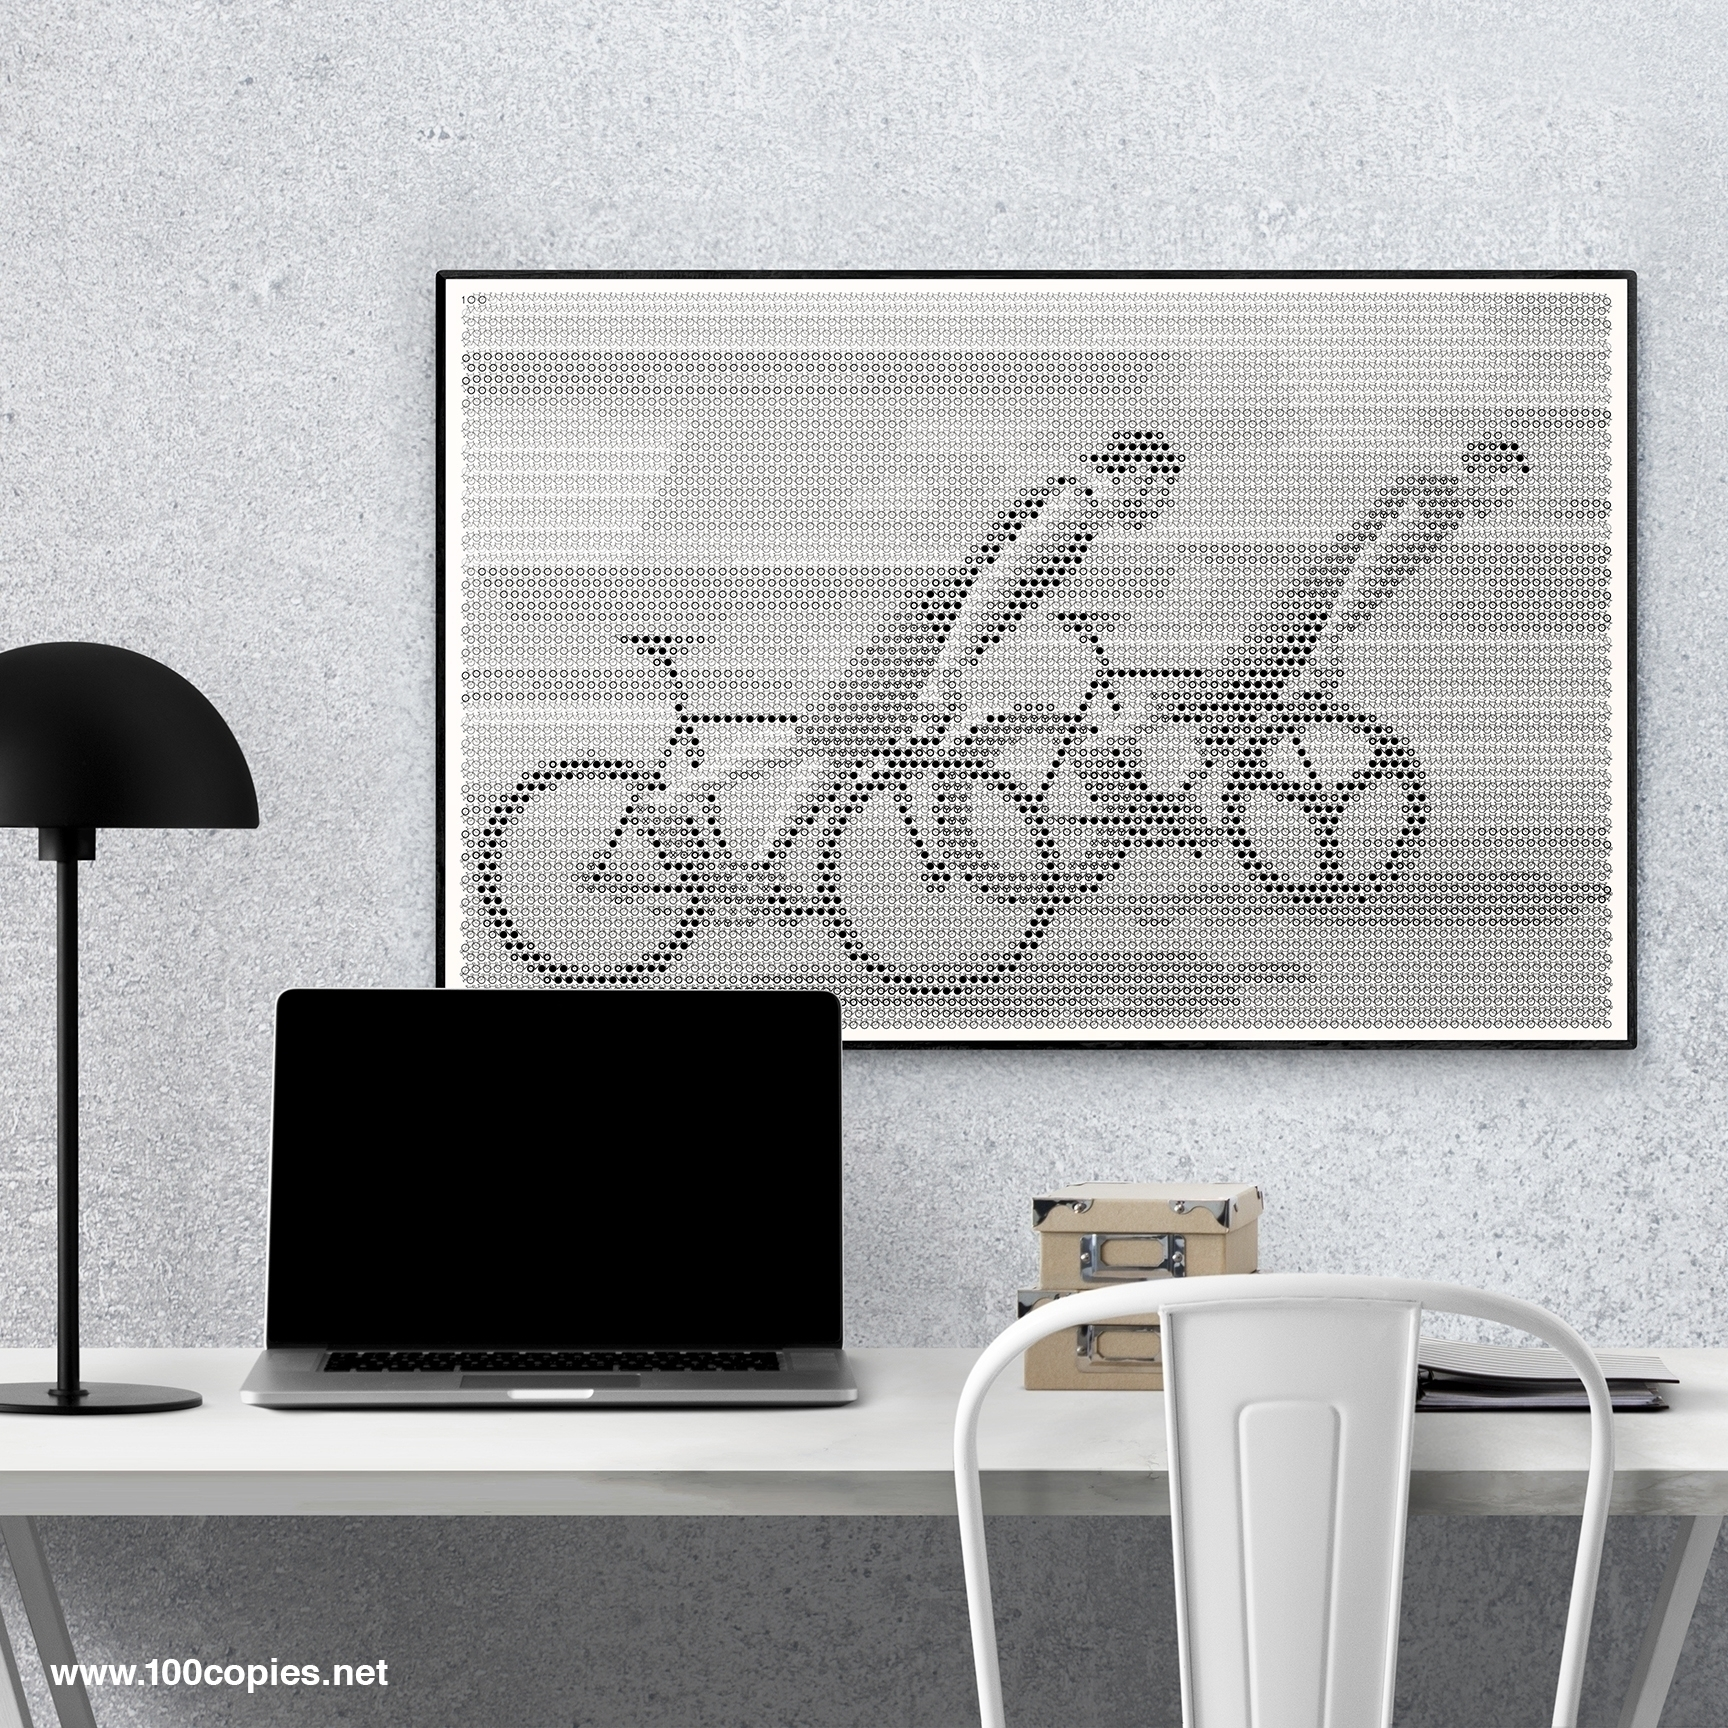 Design 40 - Skidding bicycle br - 100copies_bicycle_art | ello